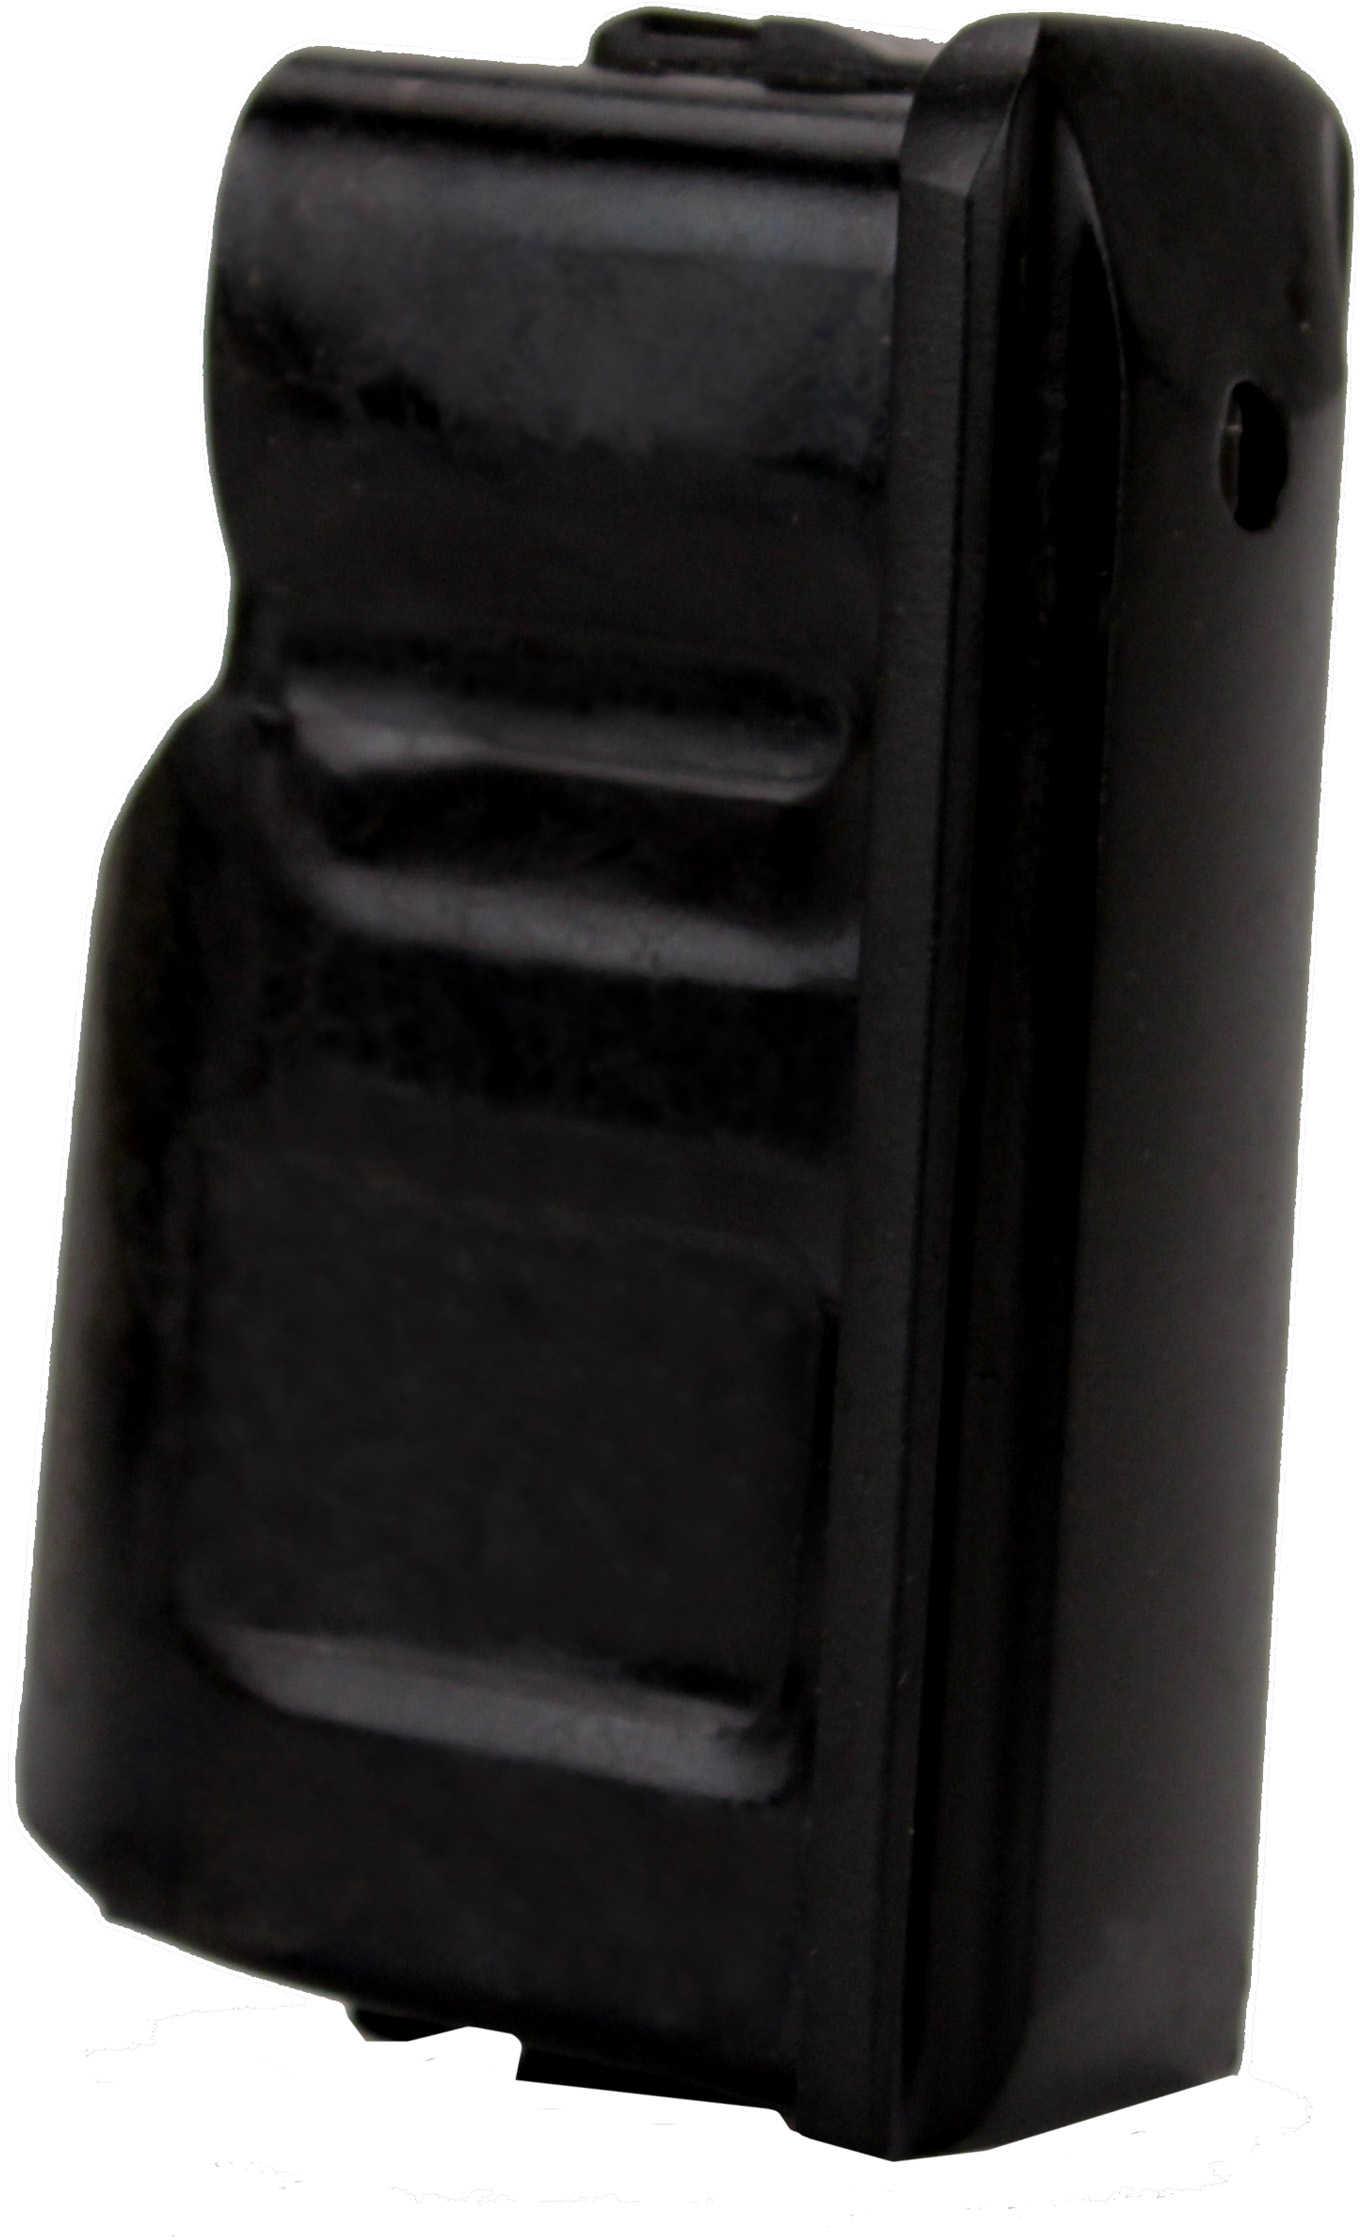 CZ Magazine 550 308 Winchester/7.62 NATO 4 Round Blued Finish 14002